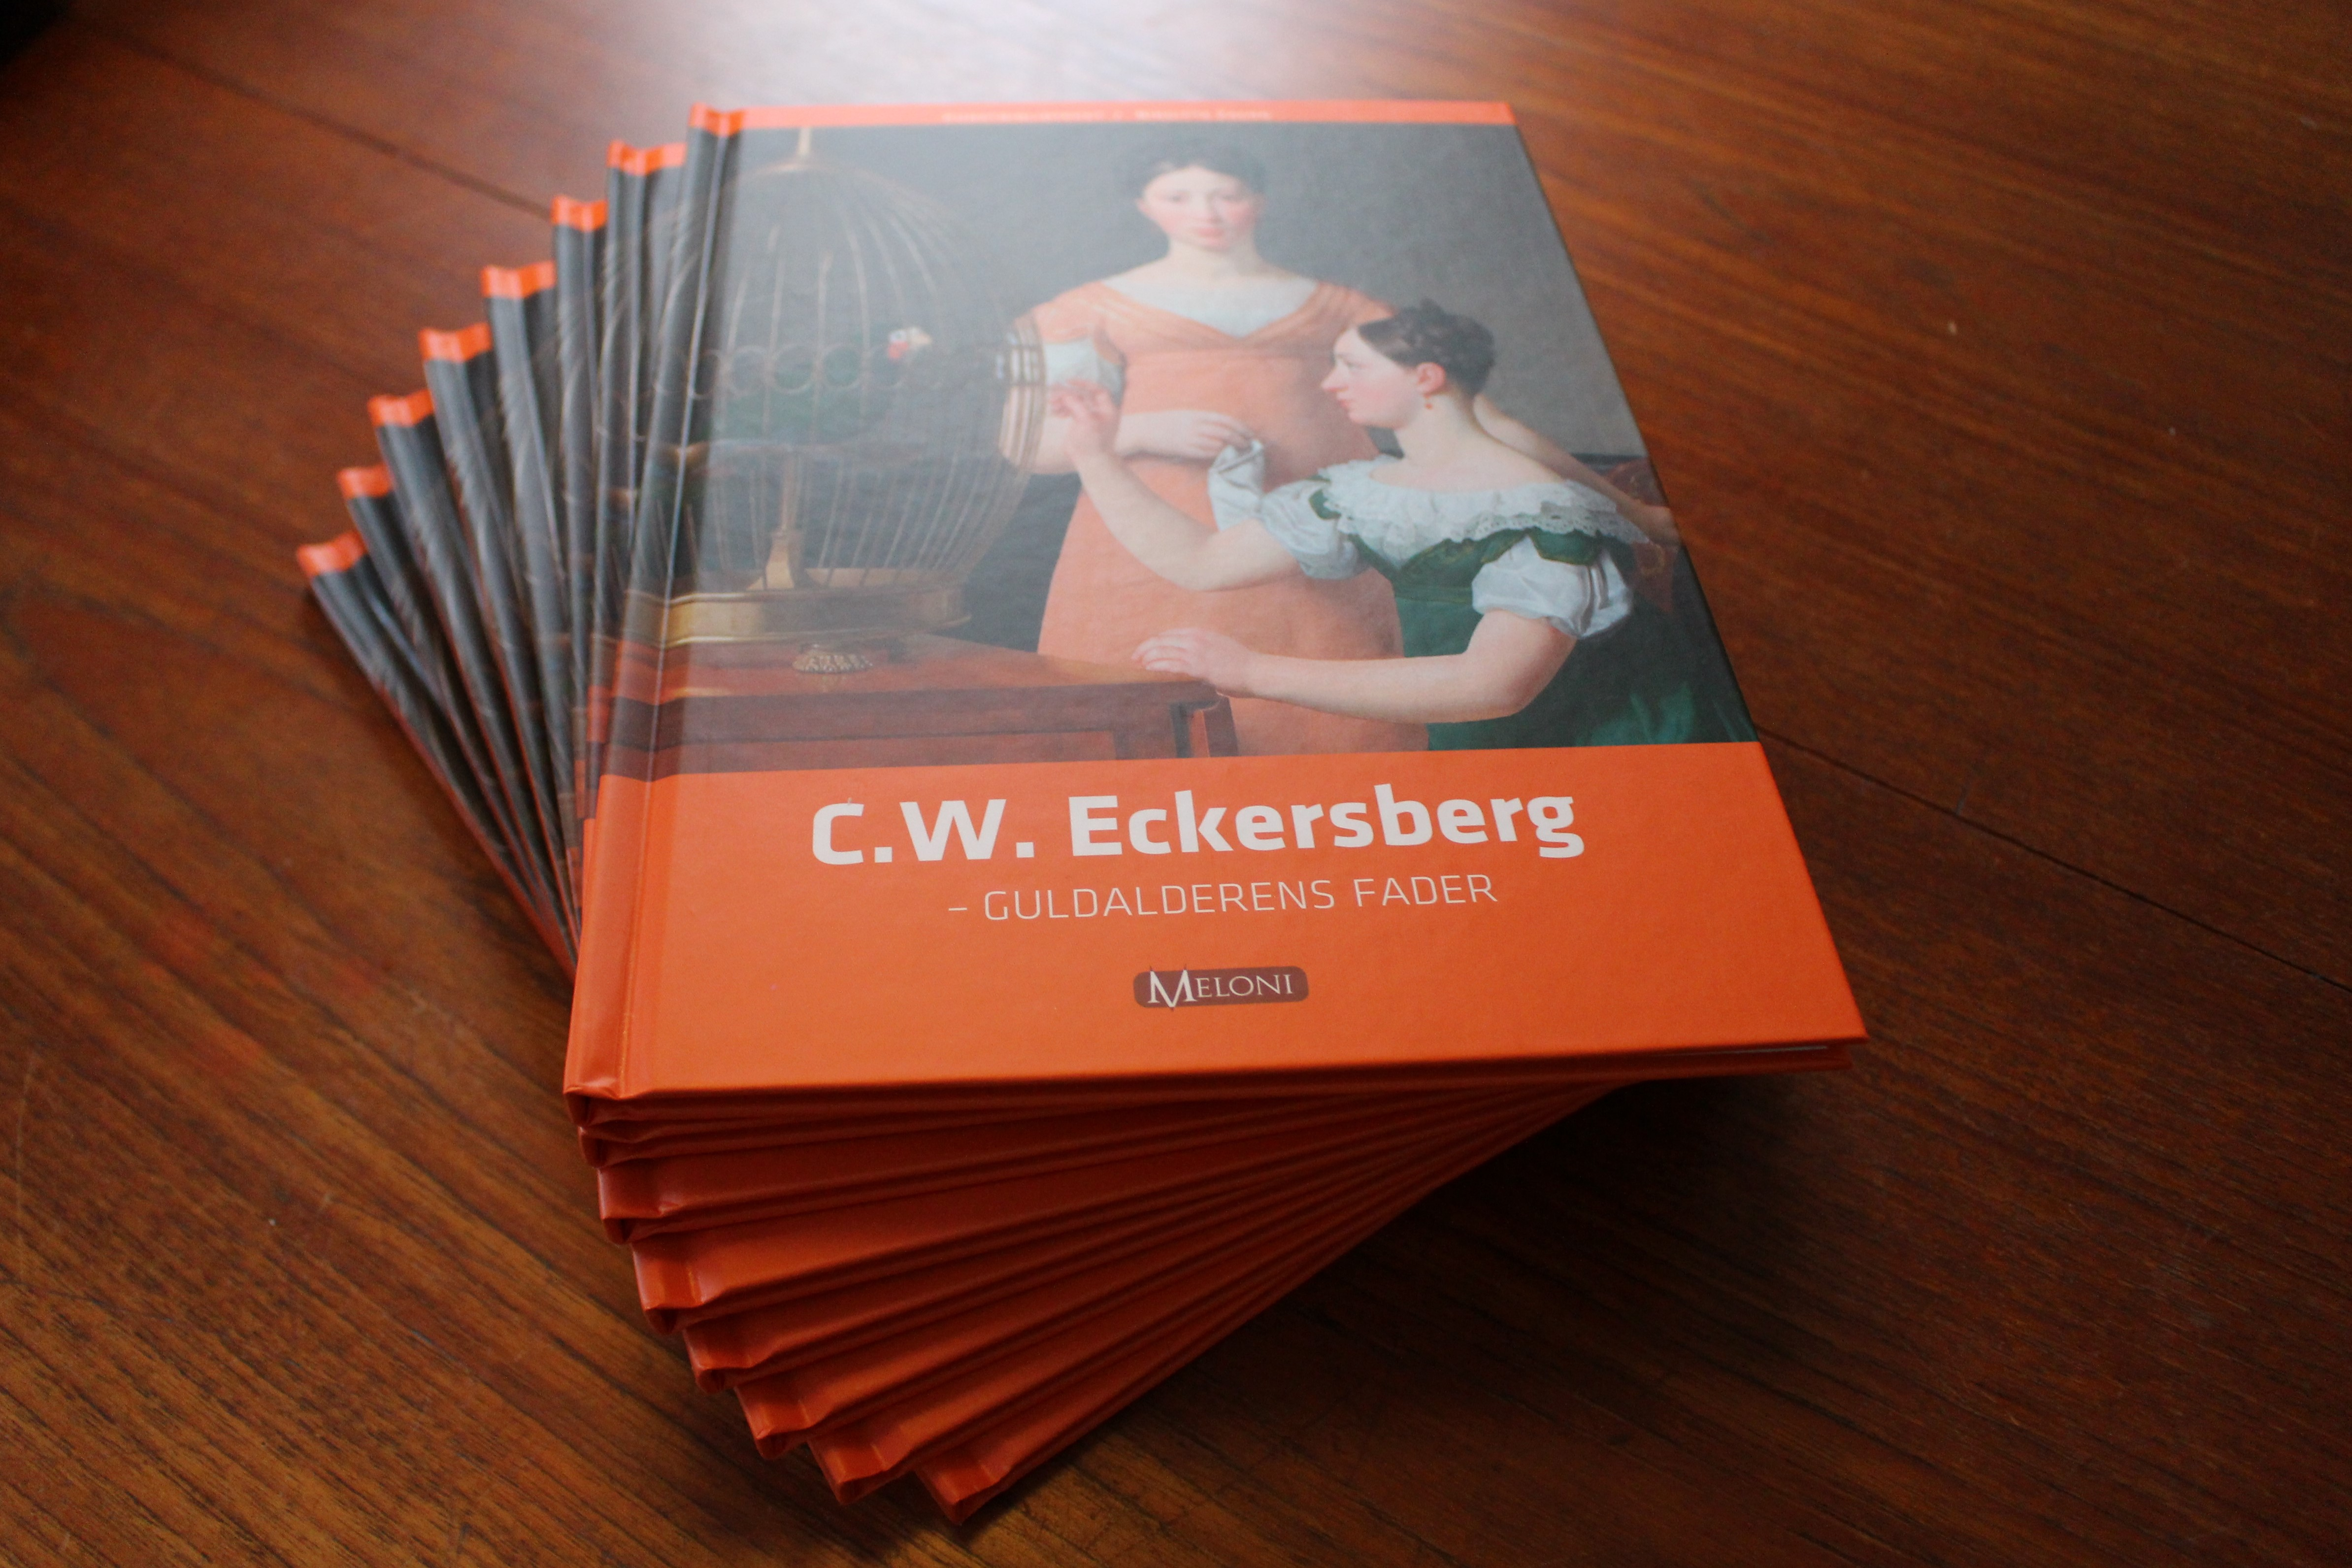 C. W. Eckersberg, forfatter Birgitte Zacho, Meloni